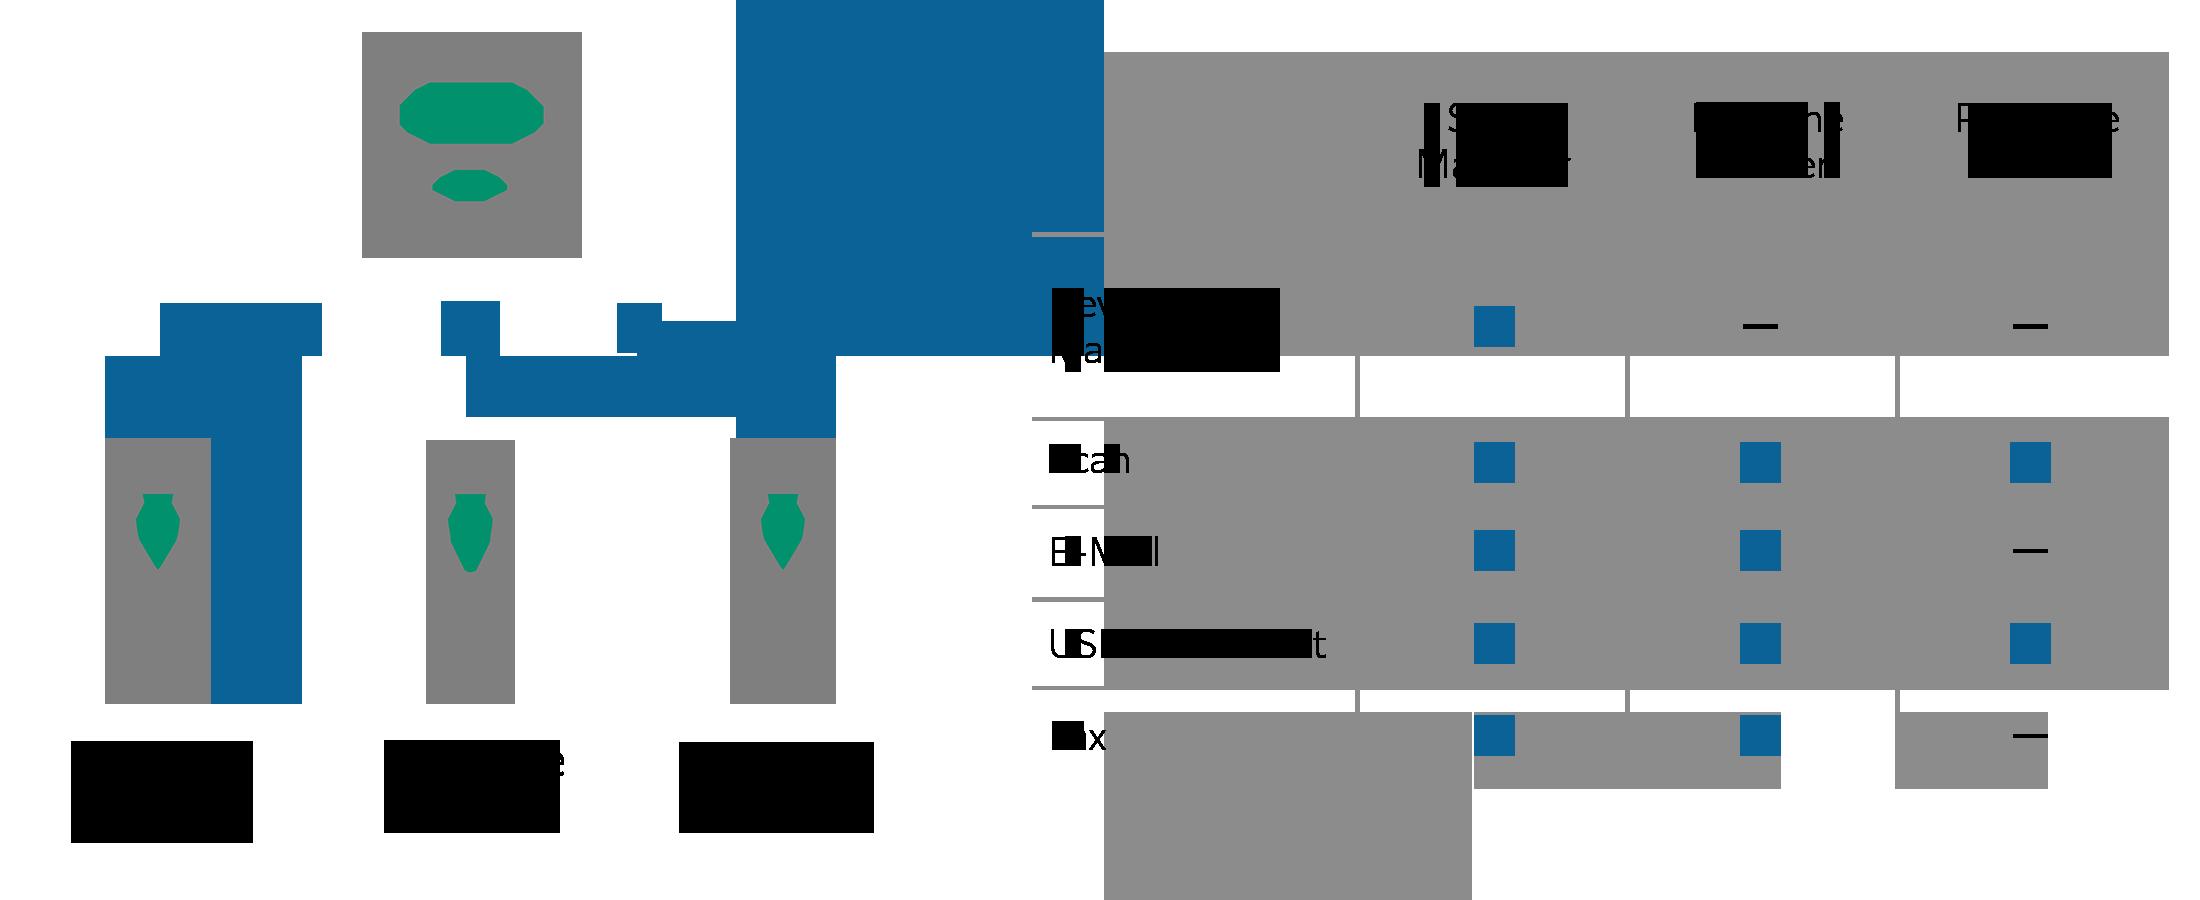 Flexible access setting